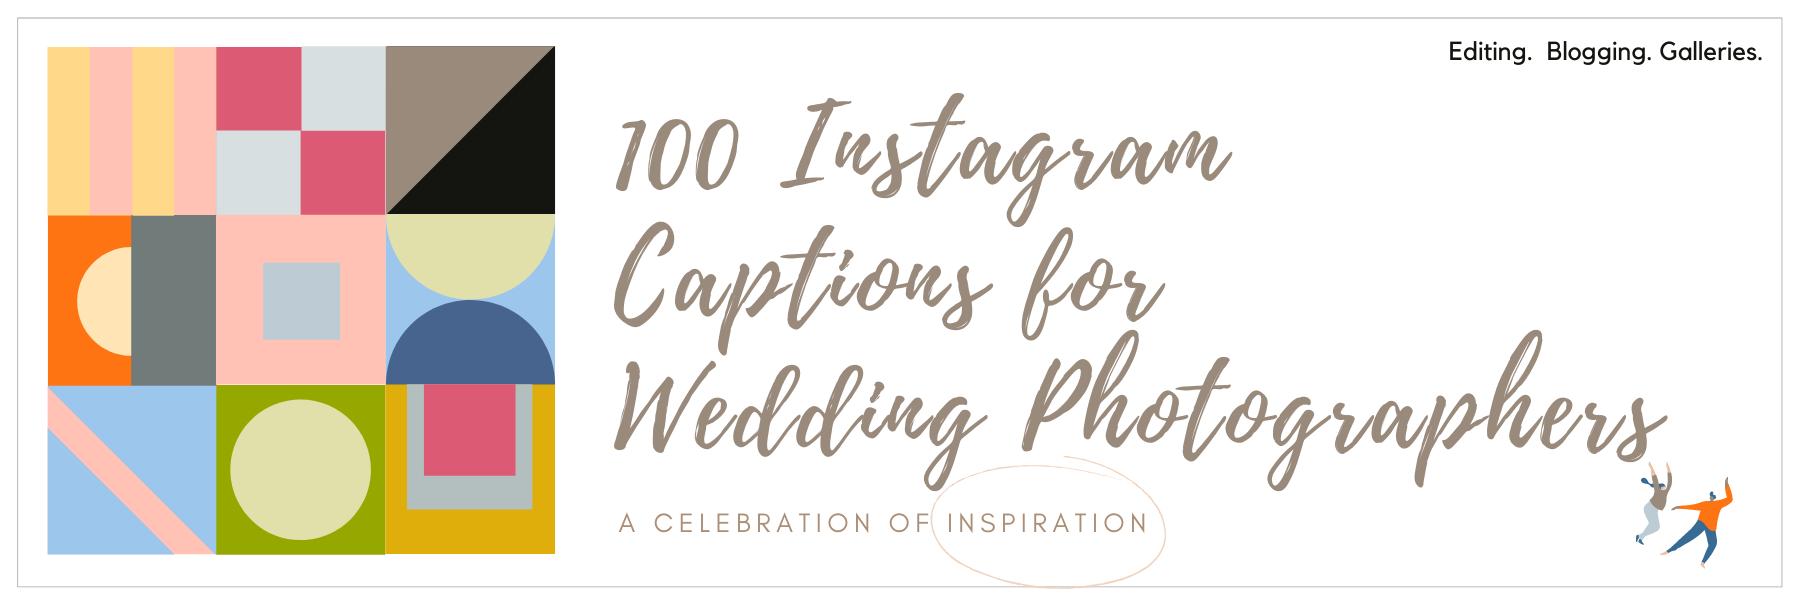 100 Instagram Captions for Wedding Photographers